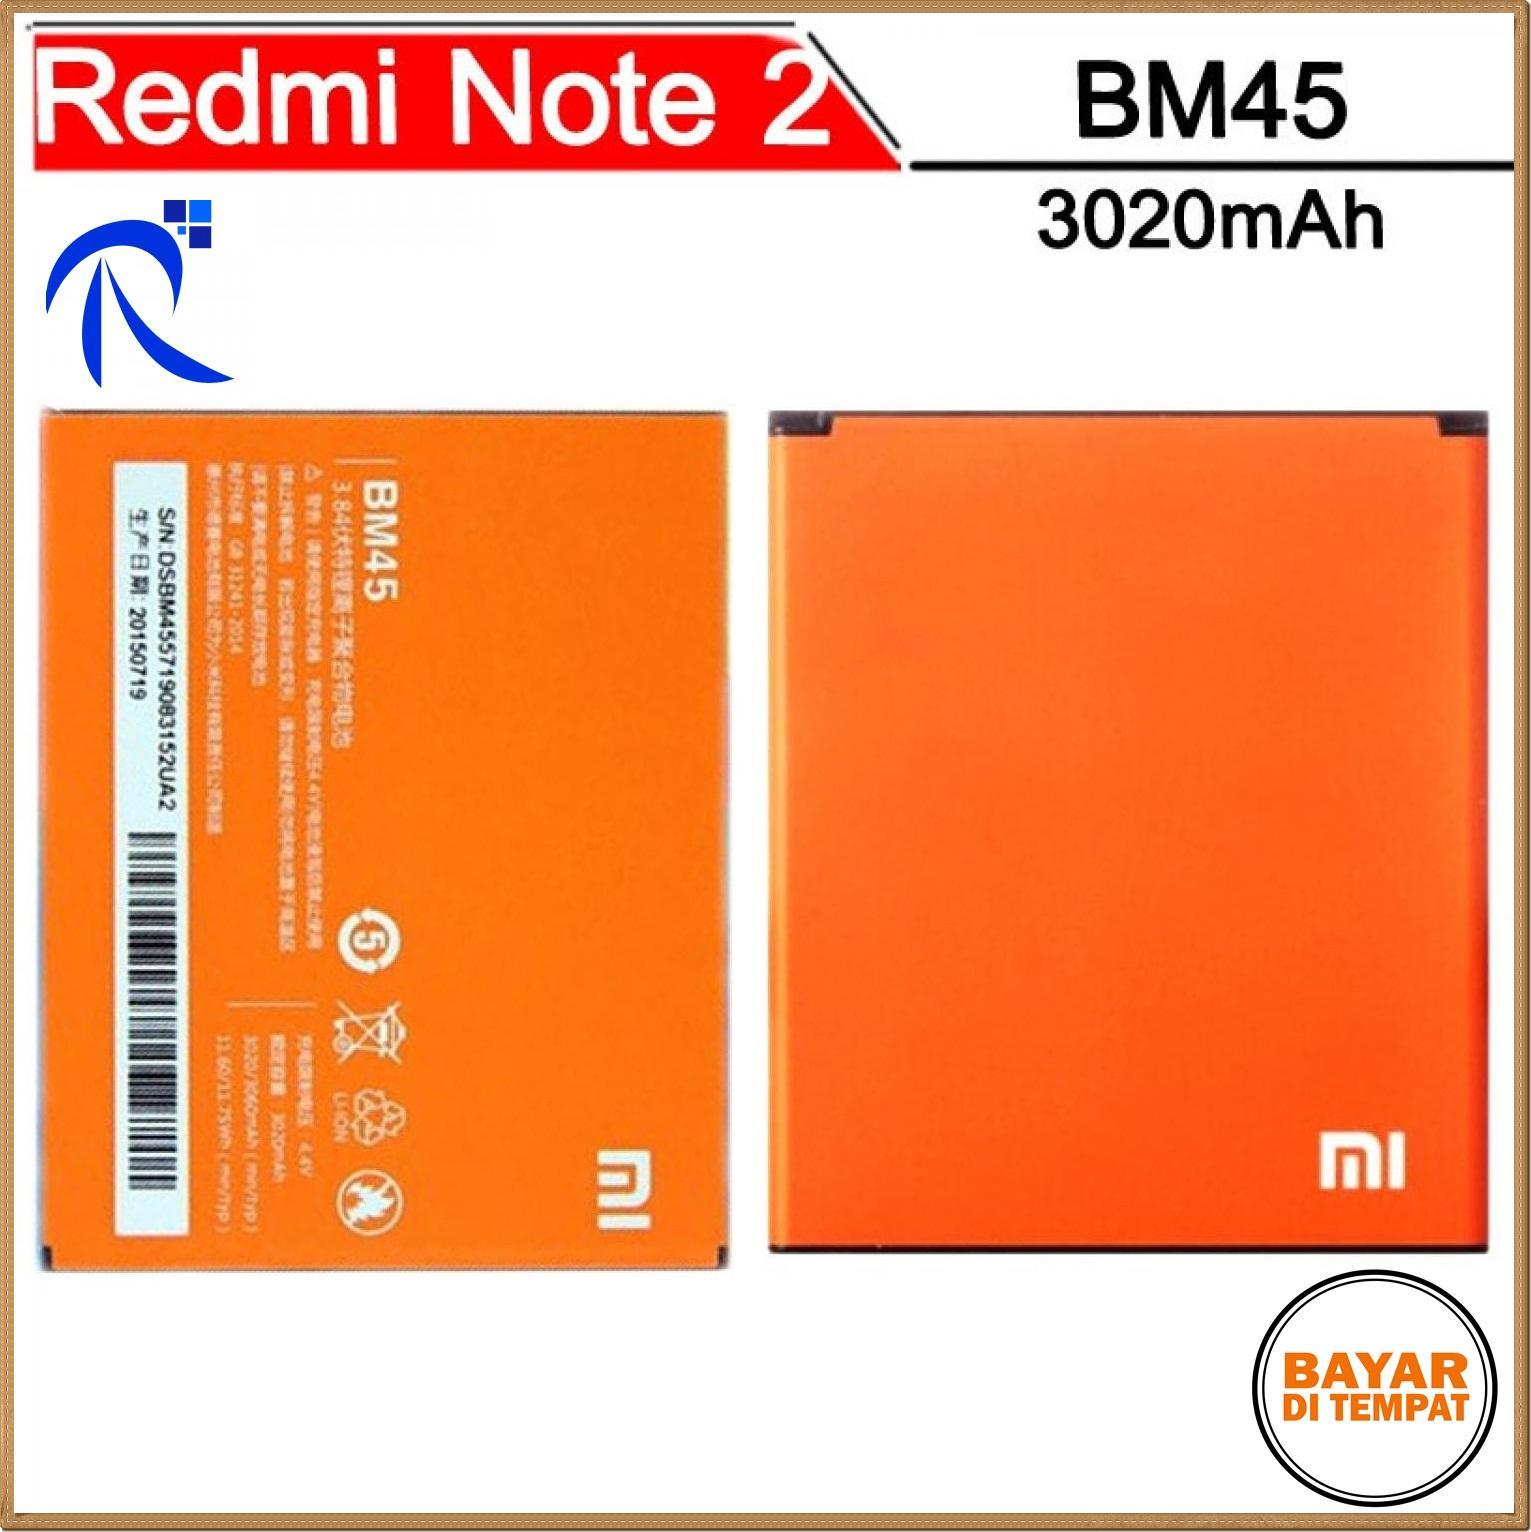 Baterai Xiaomi Redmi Note 2 3020mAh - BM45 (OEM) - Oranye / Orange - Anda dapat menggunakan batre i